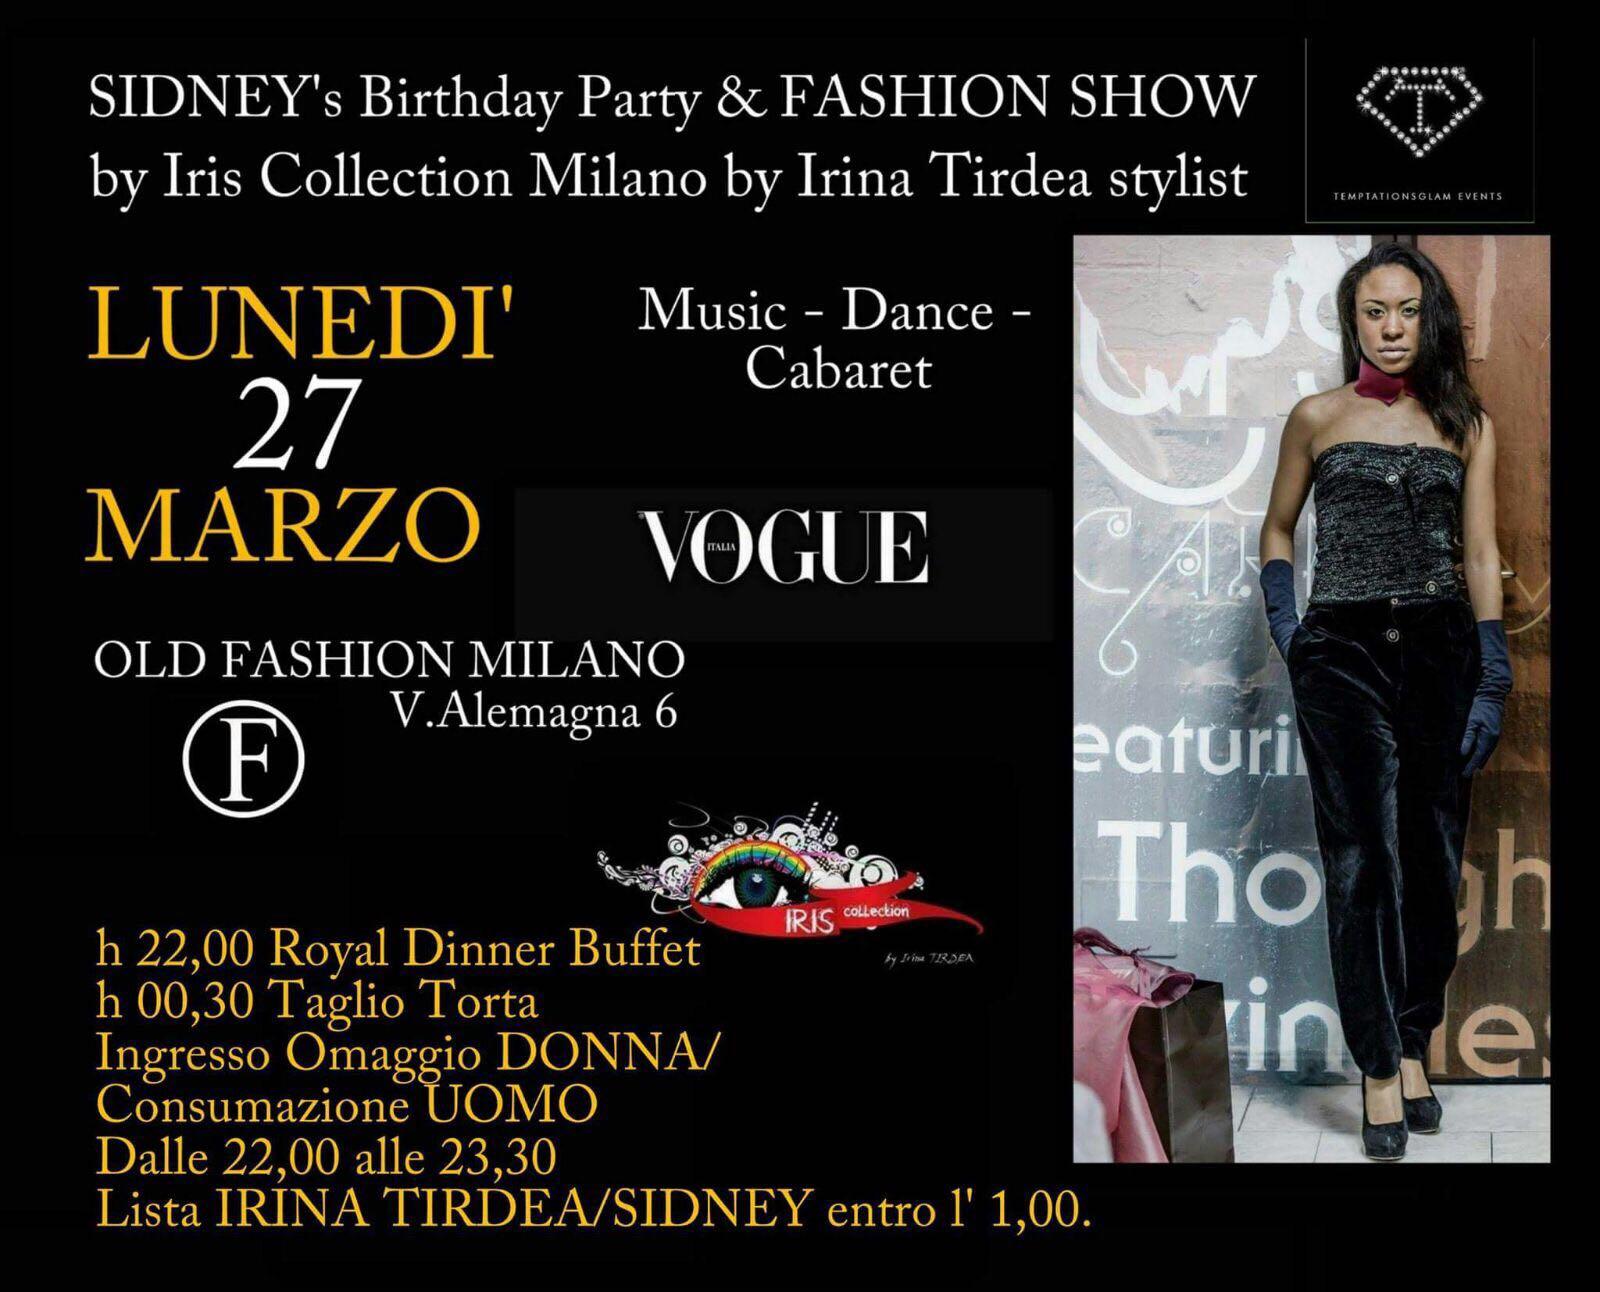 0327 fashion show marchio iris collection milano old fashion